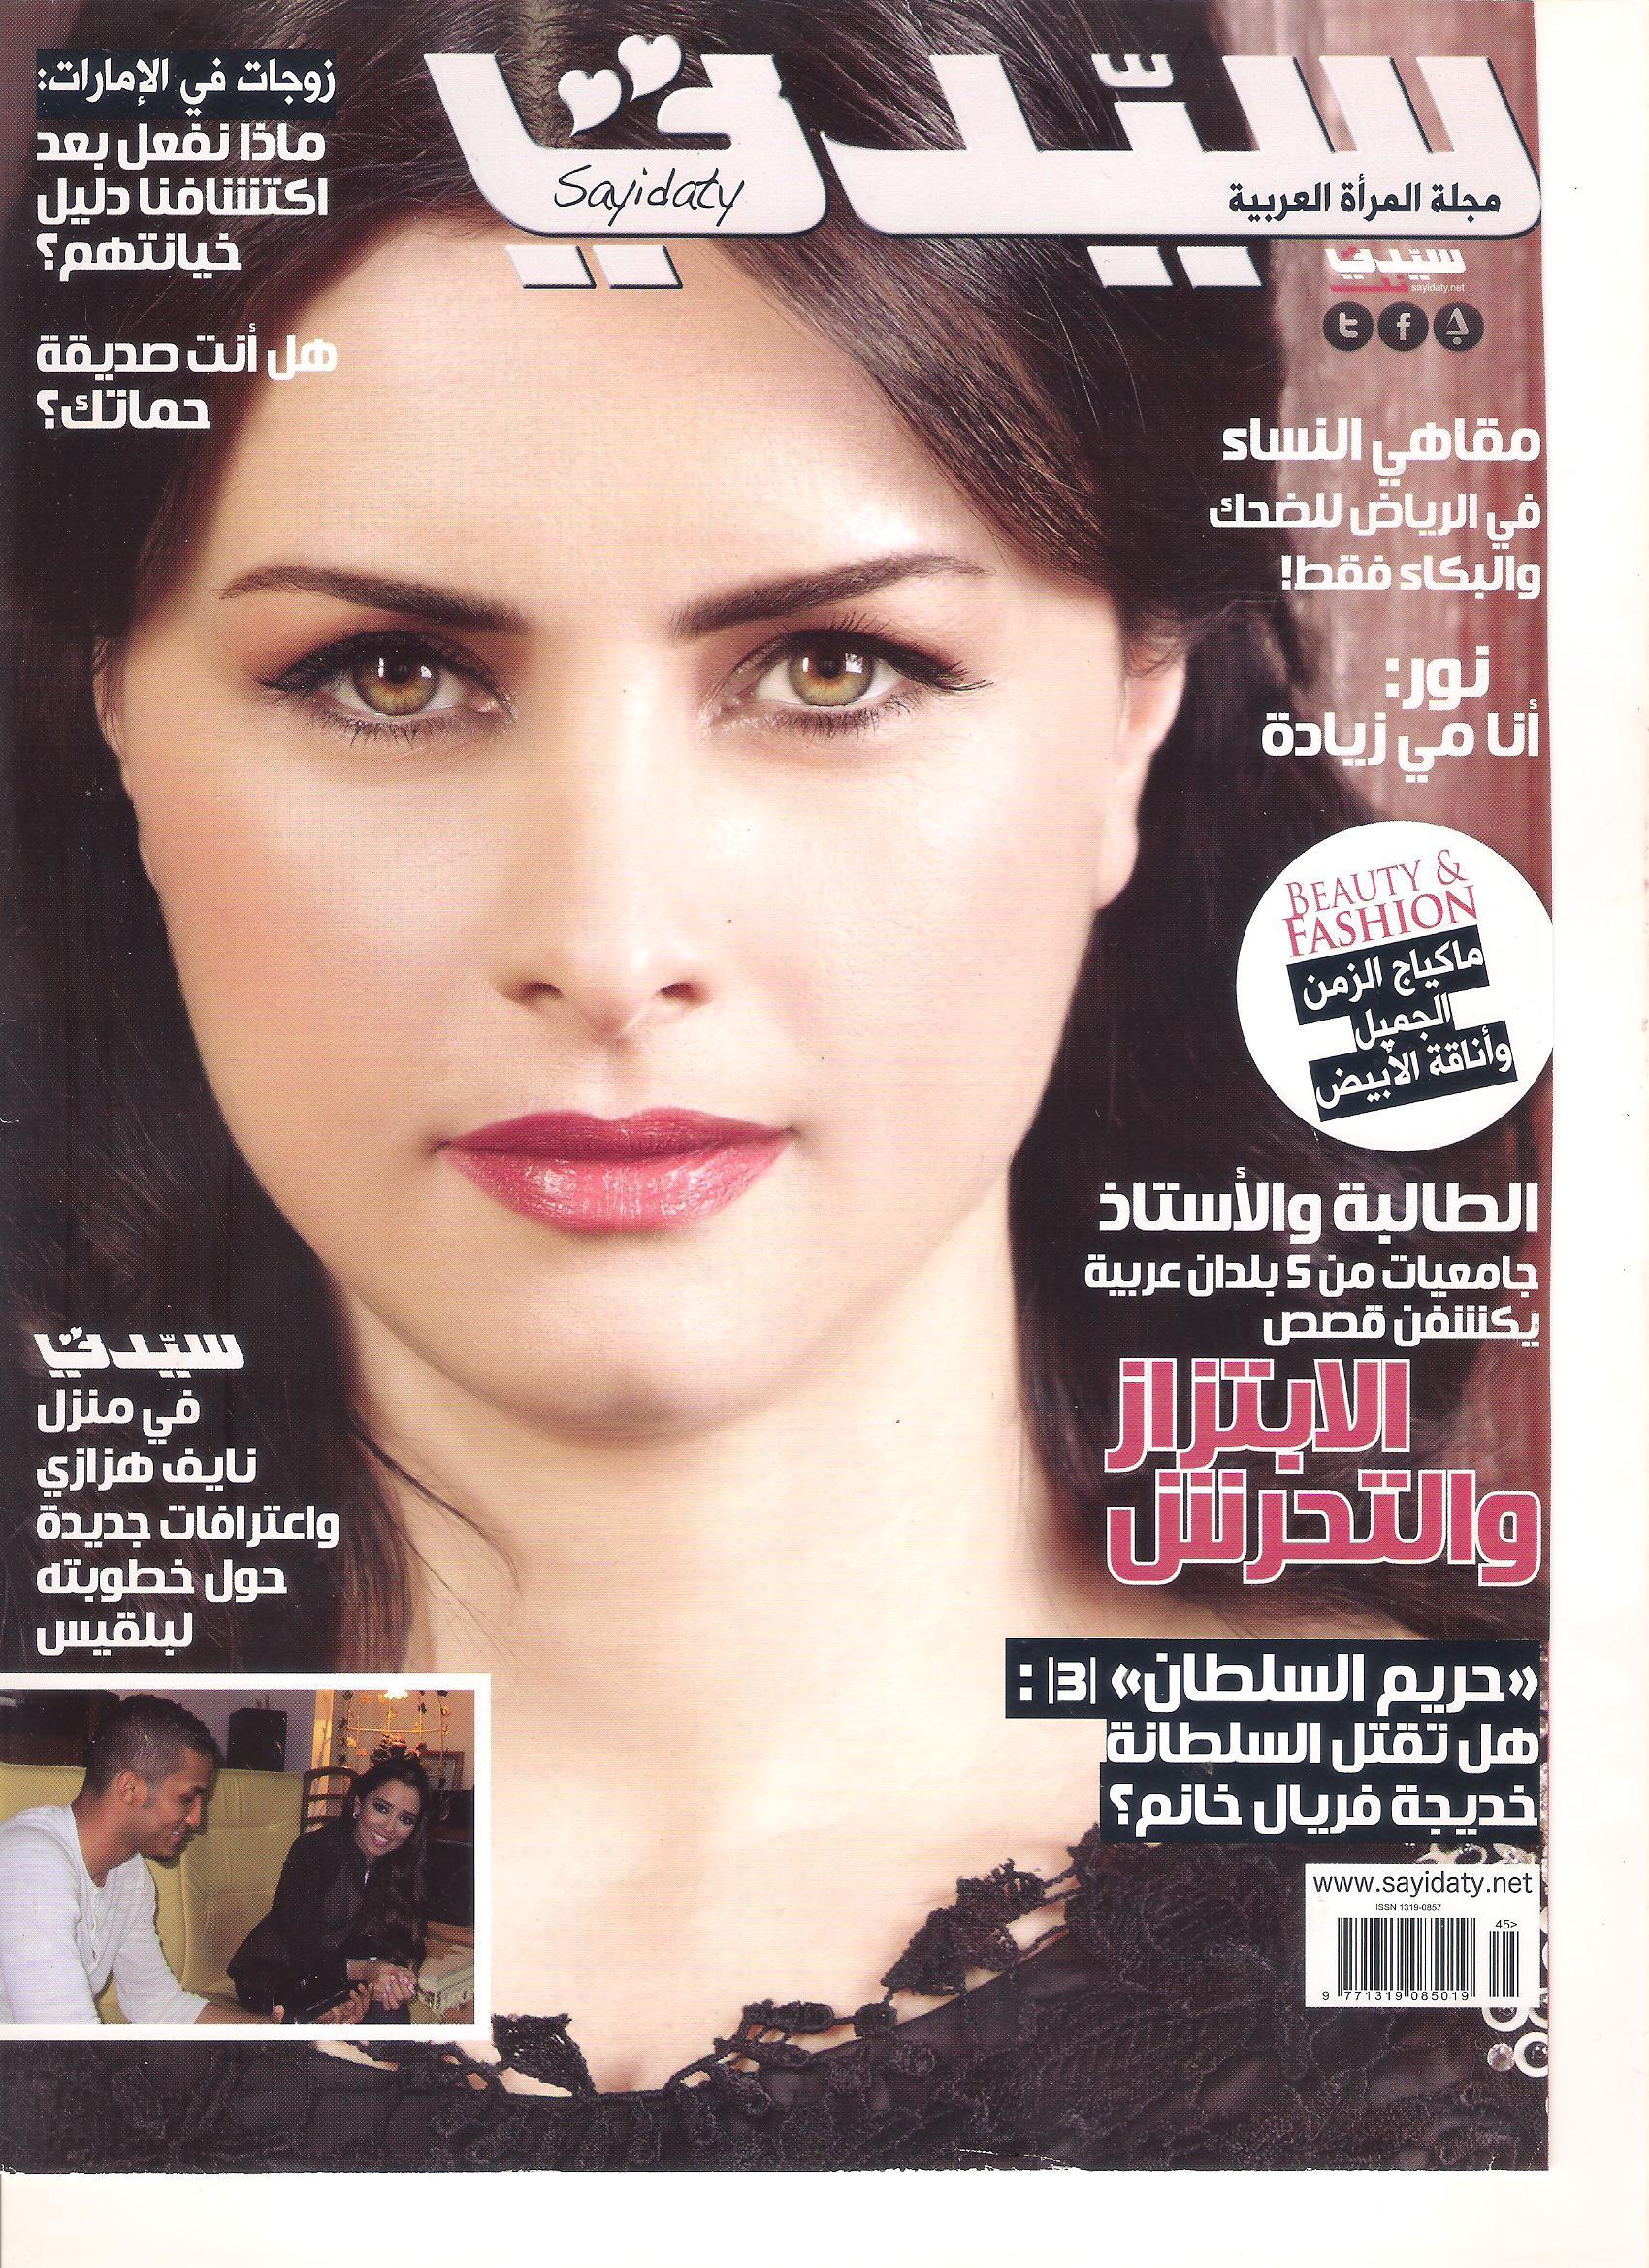 cover ori 2012 سيدتي